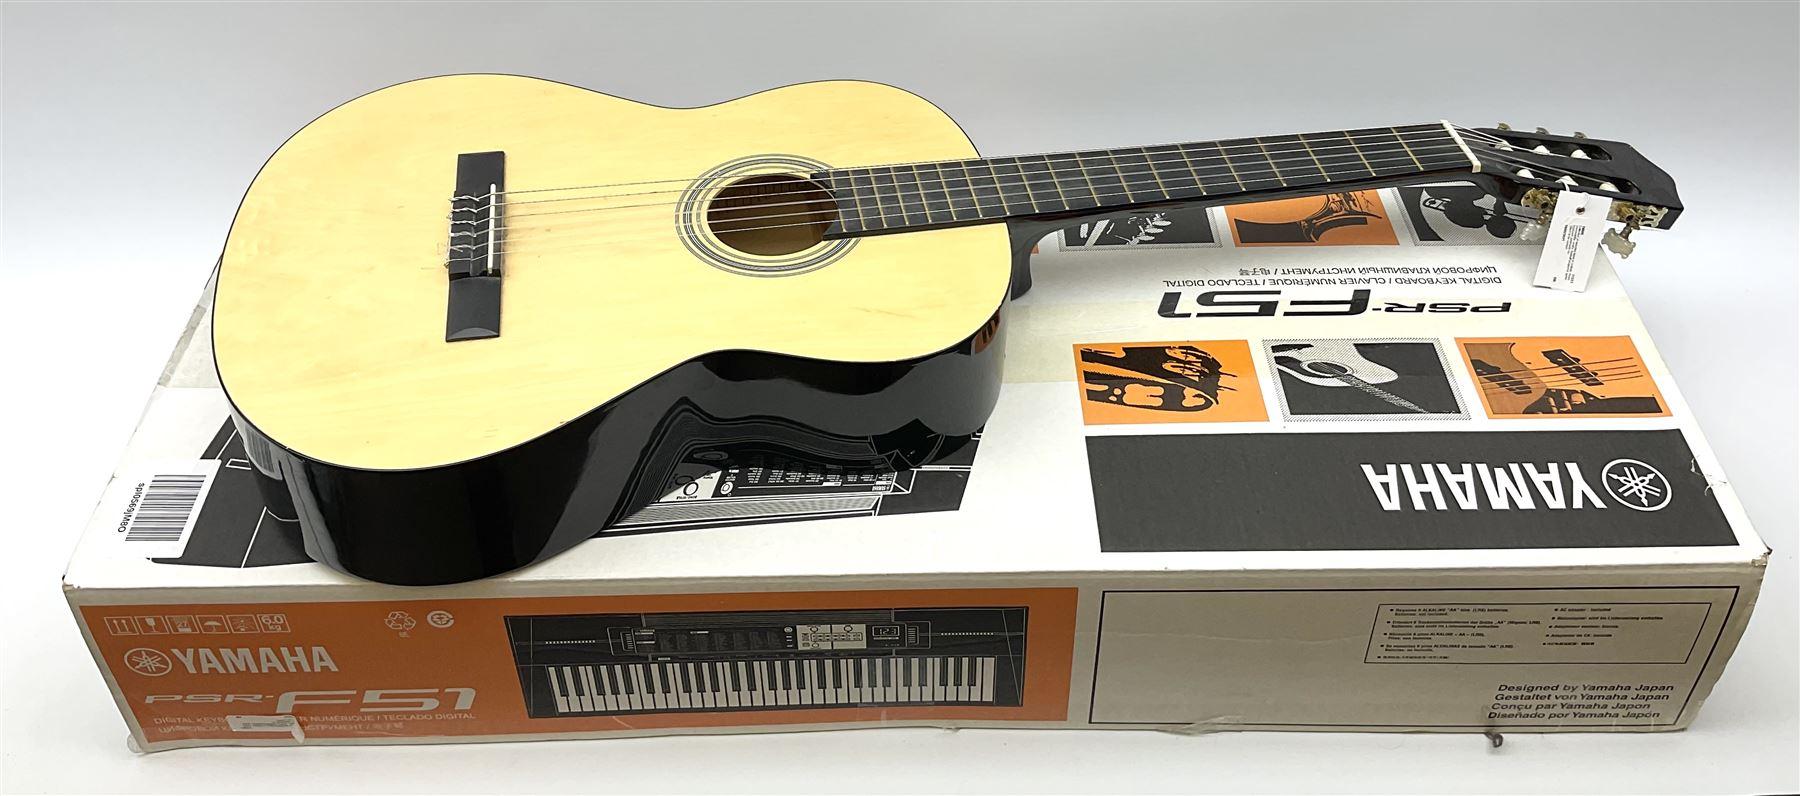 Yamaha PSR-F51 digital keyboard in original box and Elevation acoustic guitar